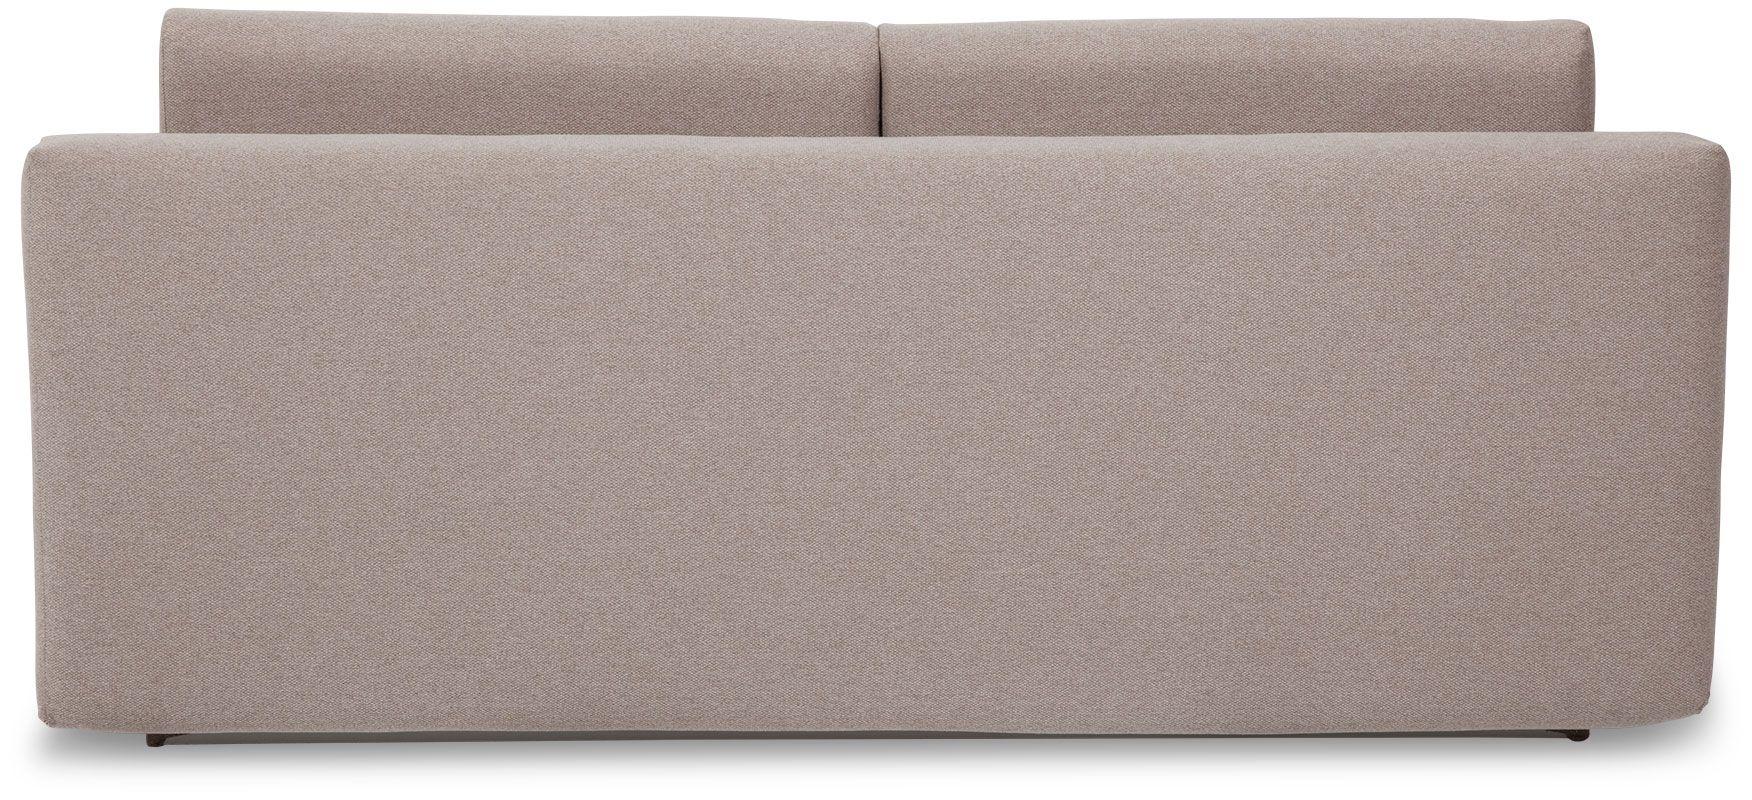 sofa preston 12